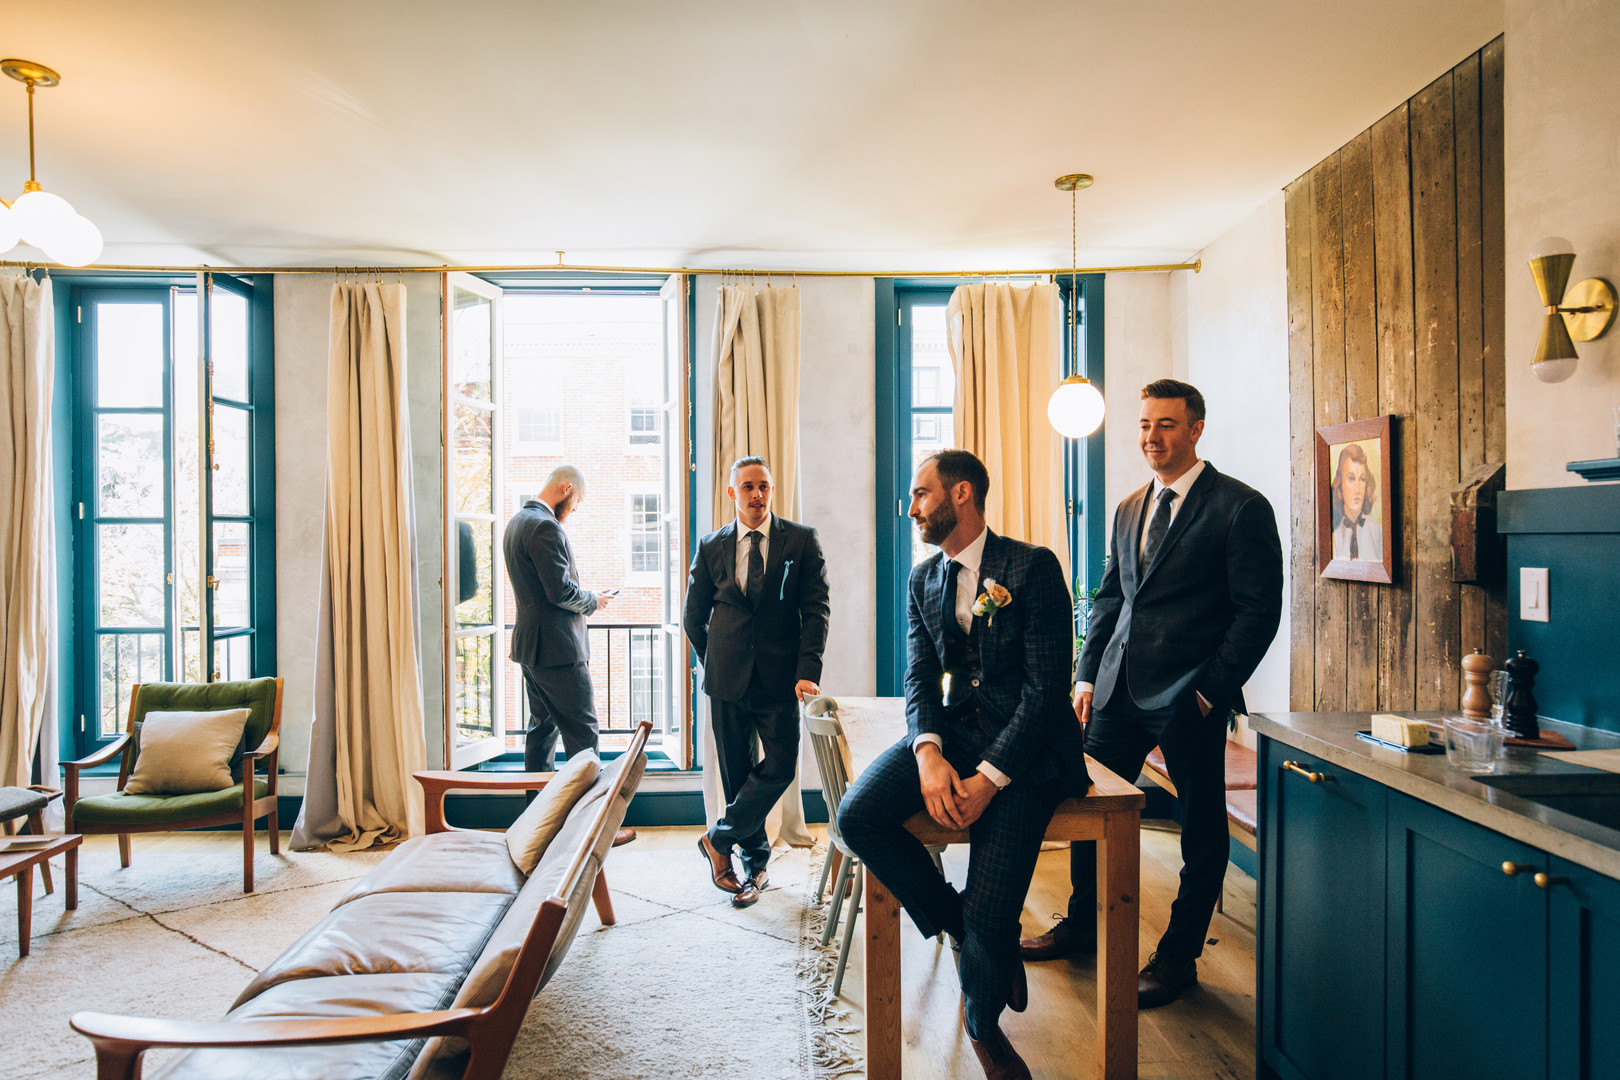 Groomsmen candid at Lokal hotel, Philadelphia